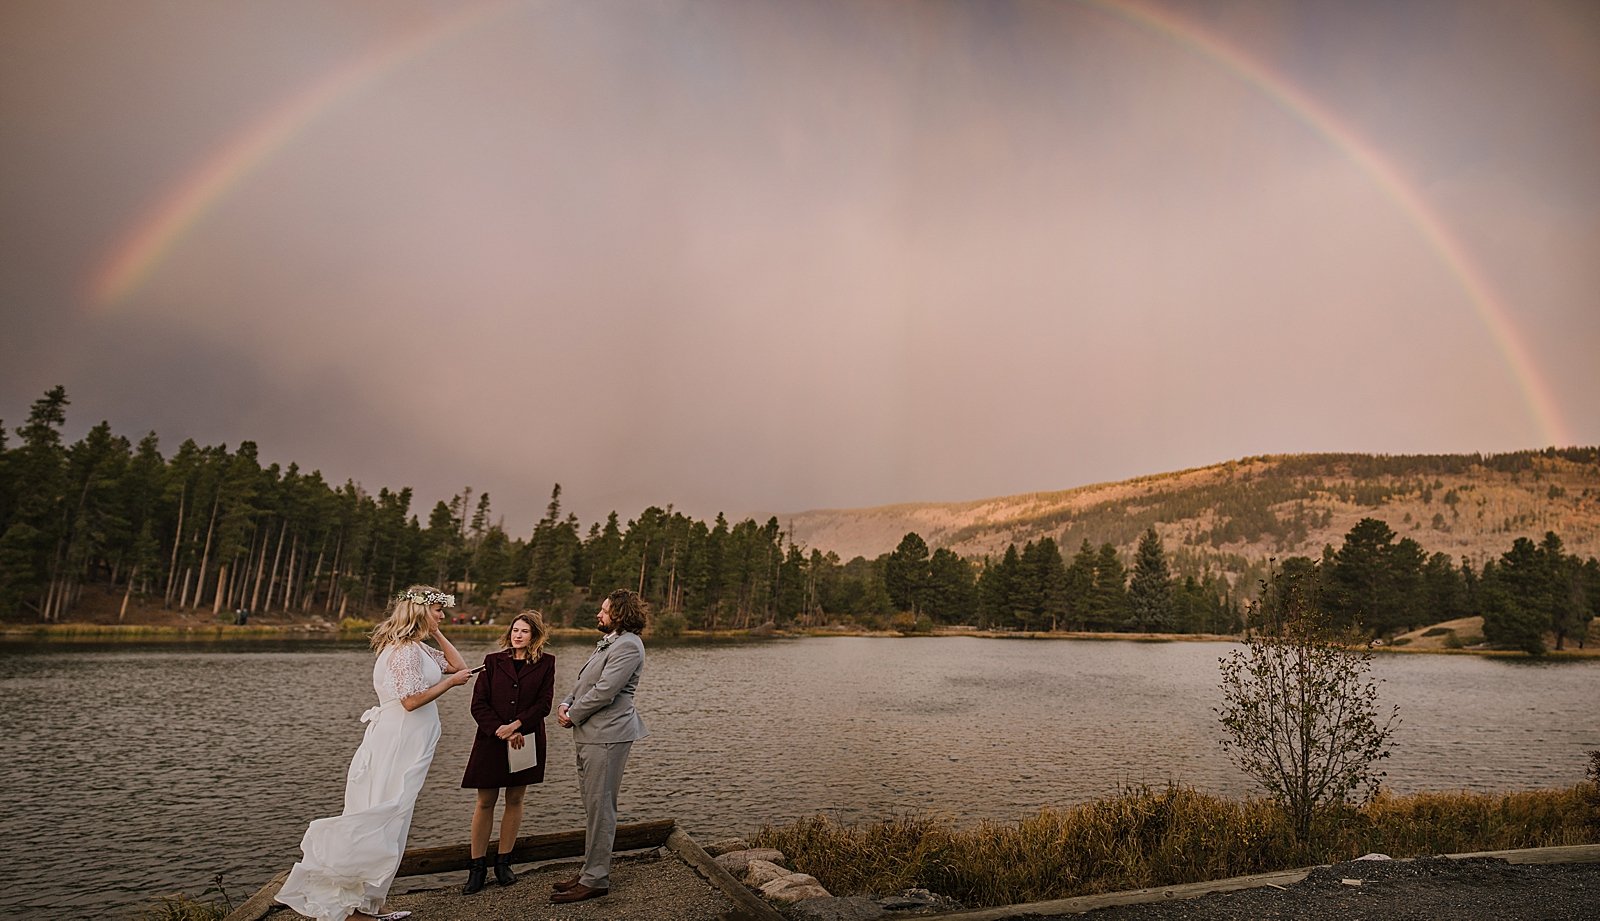 stormy-sunrise-elopement-at-sprague-lake-in-rocky-mountain-national-park-estes-park-colorado_0133.jpg